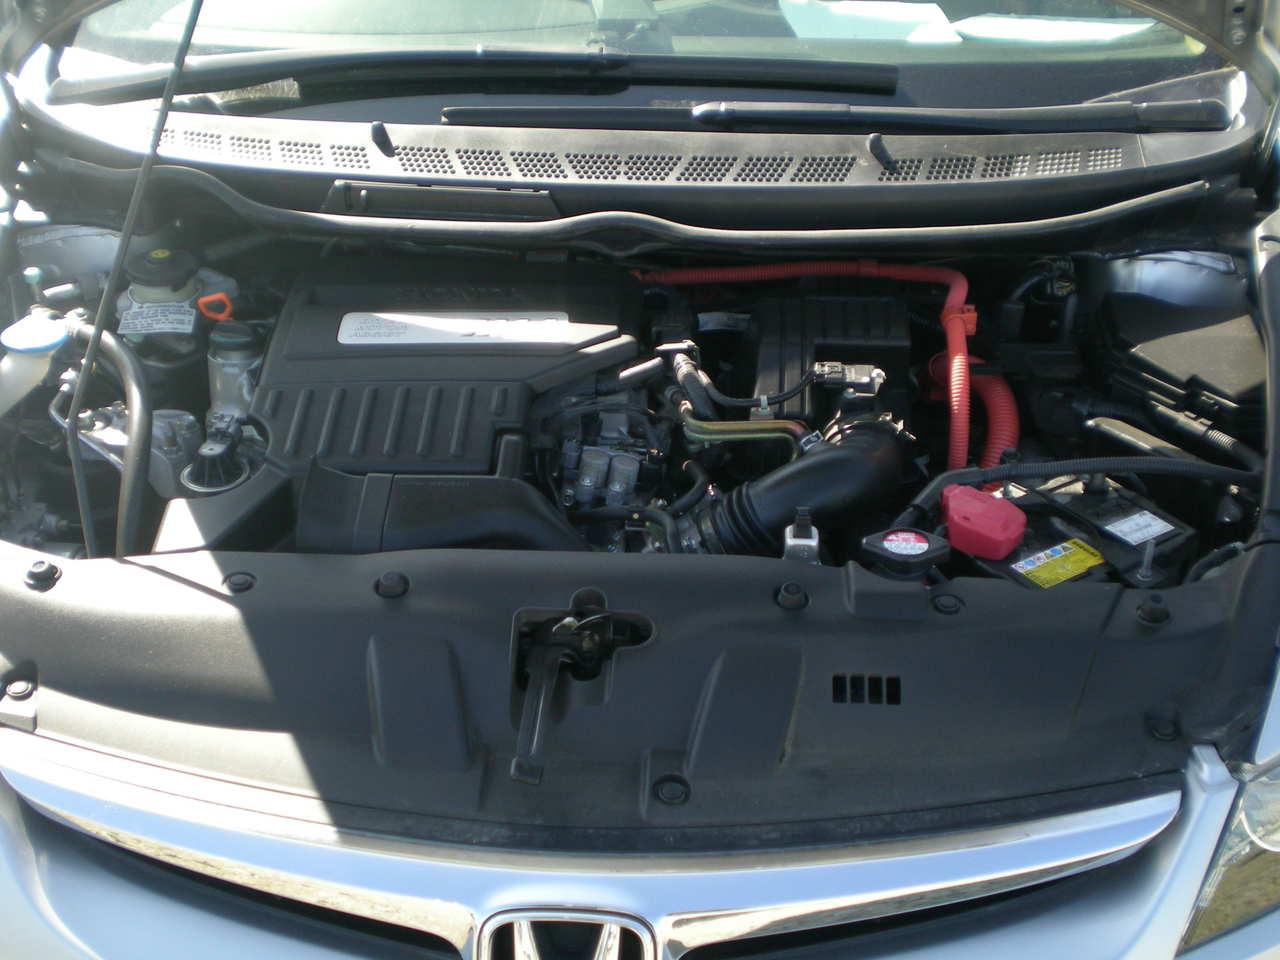 2005 Honda Civic Hybrid Pics, 1.3, FF, Automatic For Sale